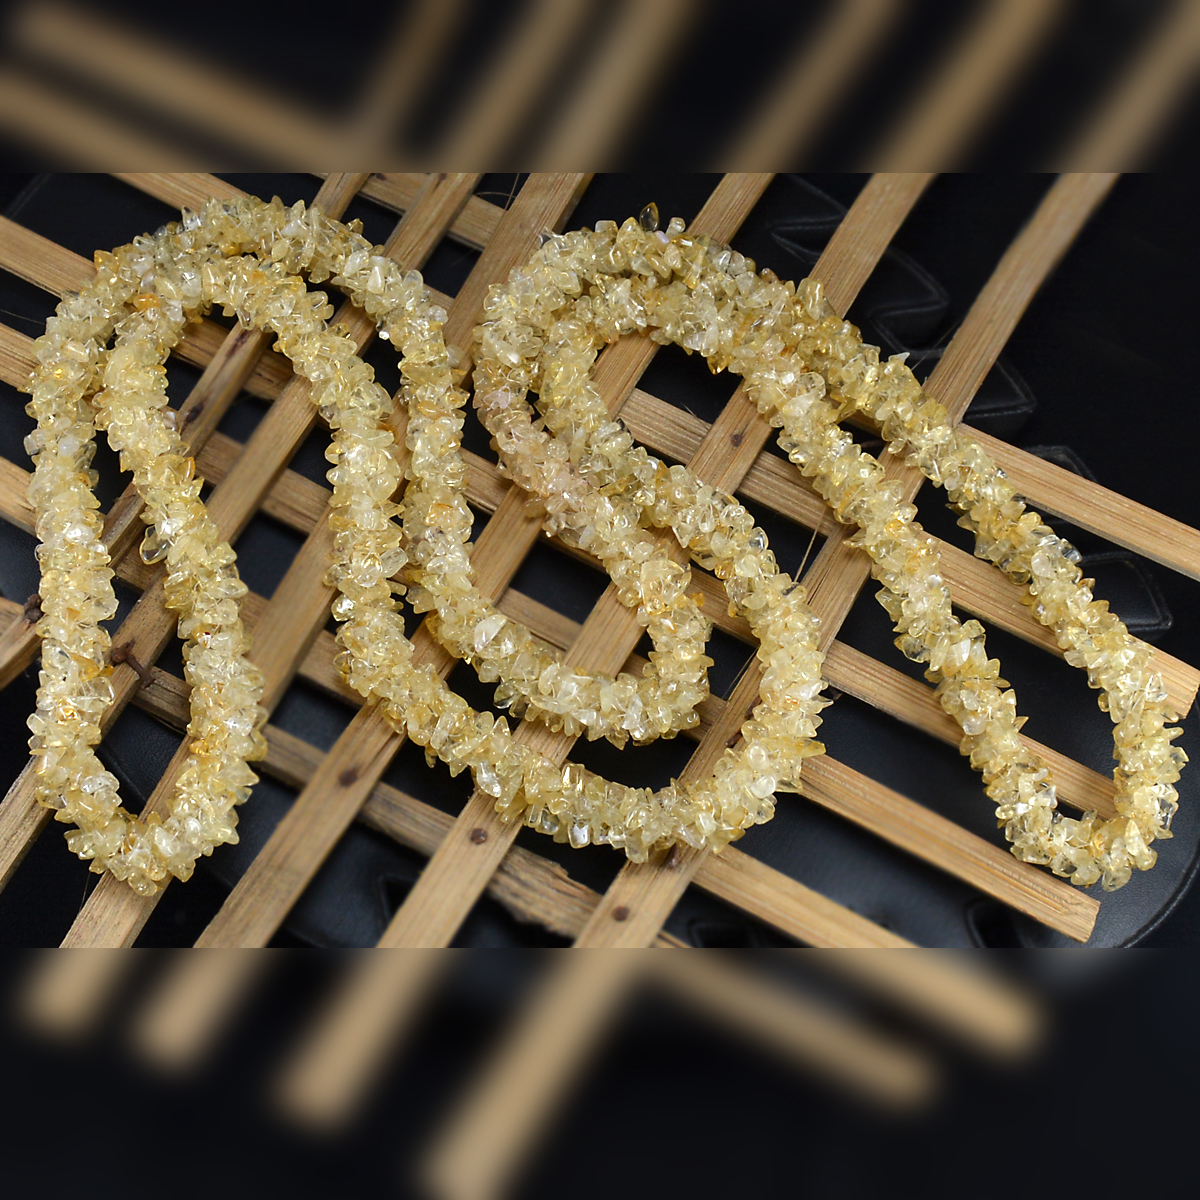 Handmade Jewelry Manufacturer Citrine Gemstone Chips Necklace Jaipur Rajasthan India